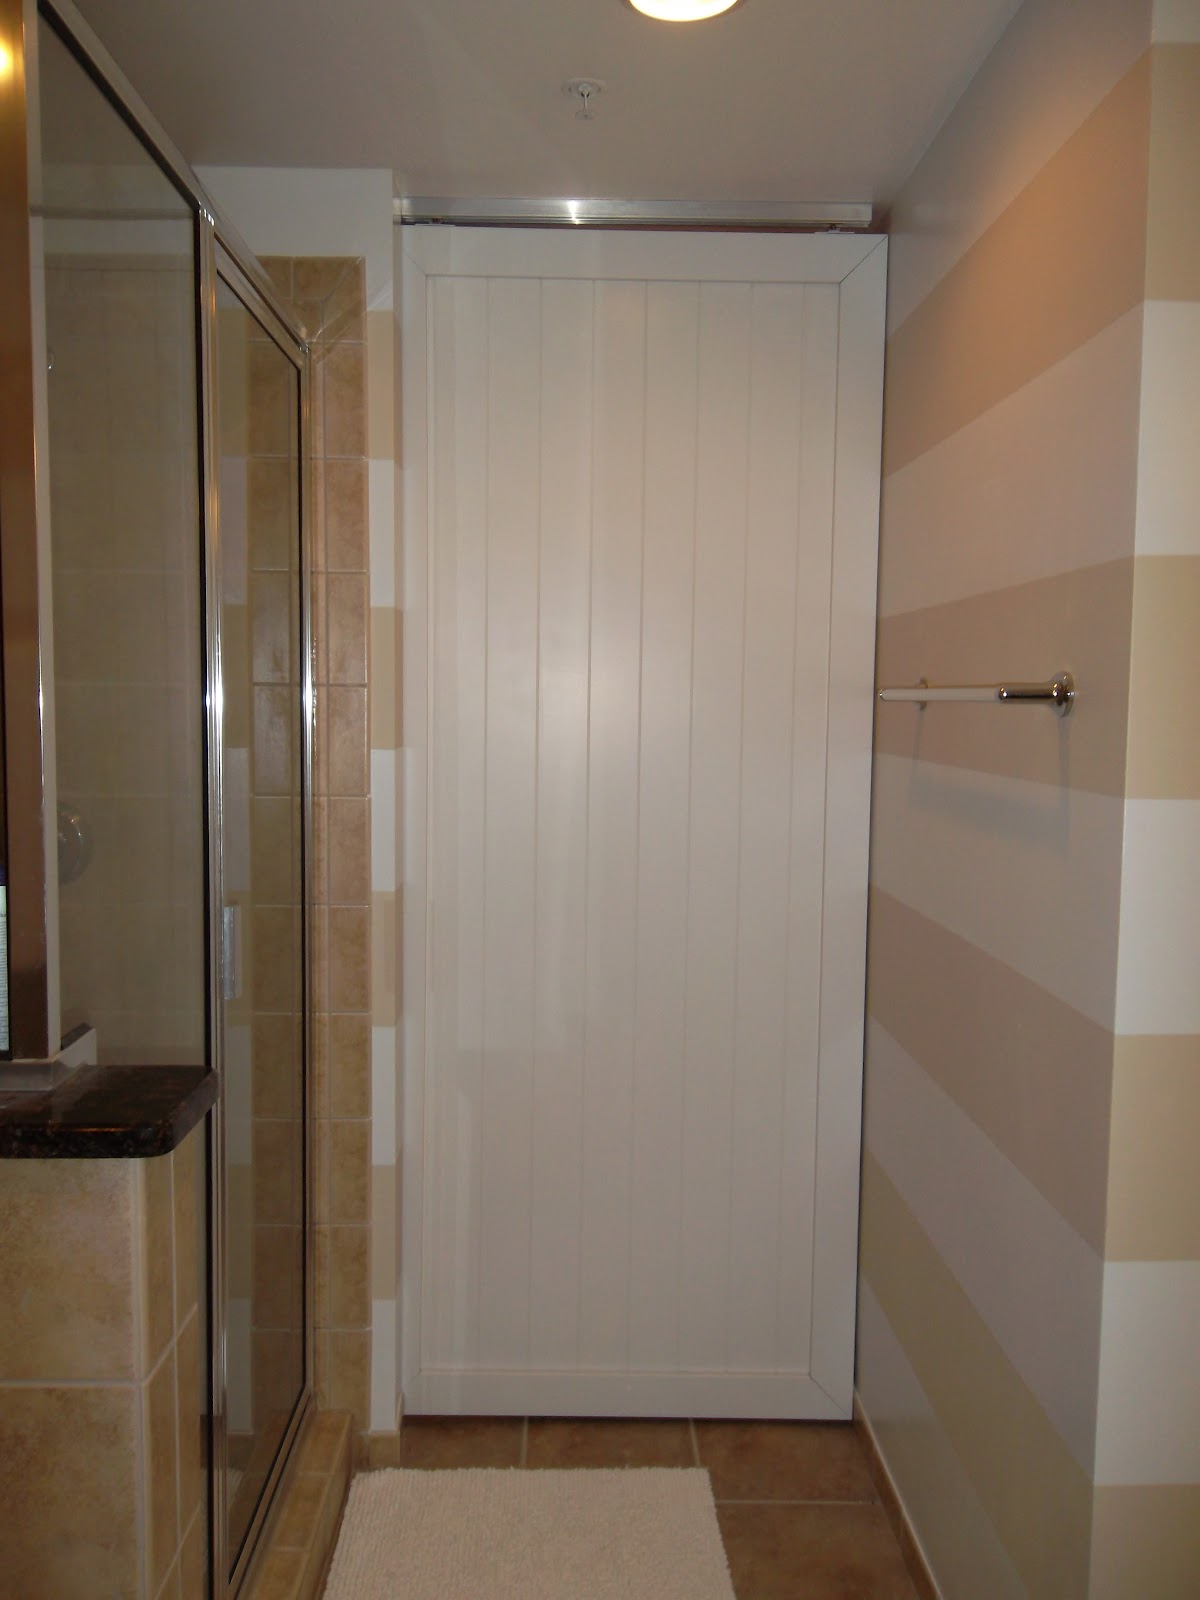 Quirks And Progress Diy How To Make Sliding Loft Doors